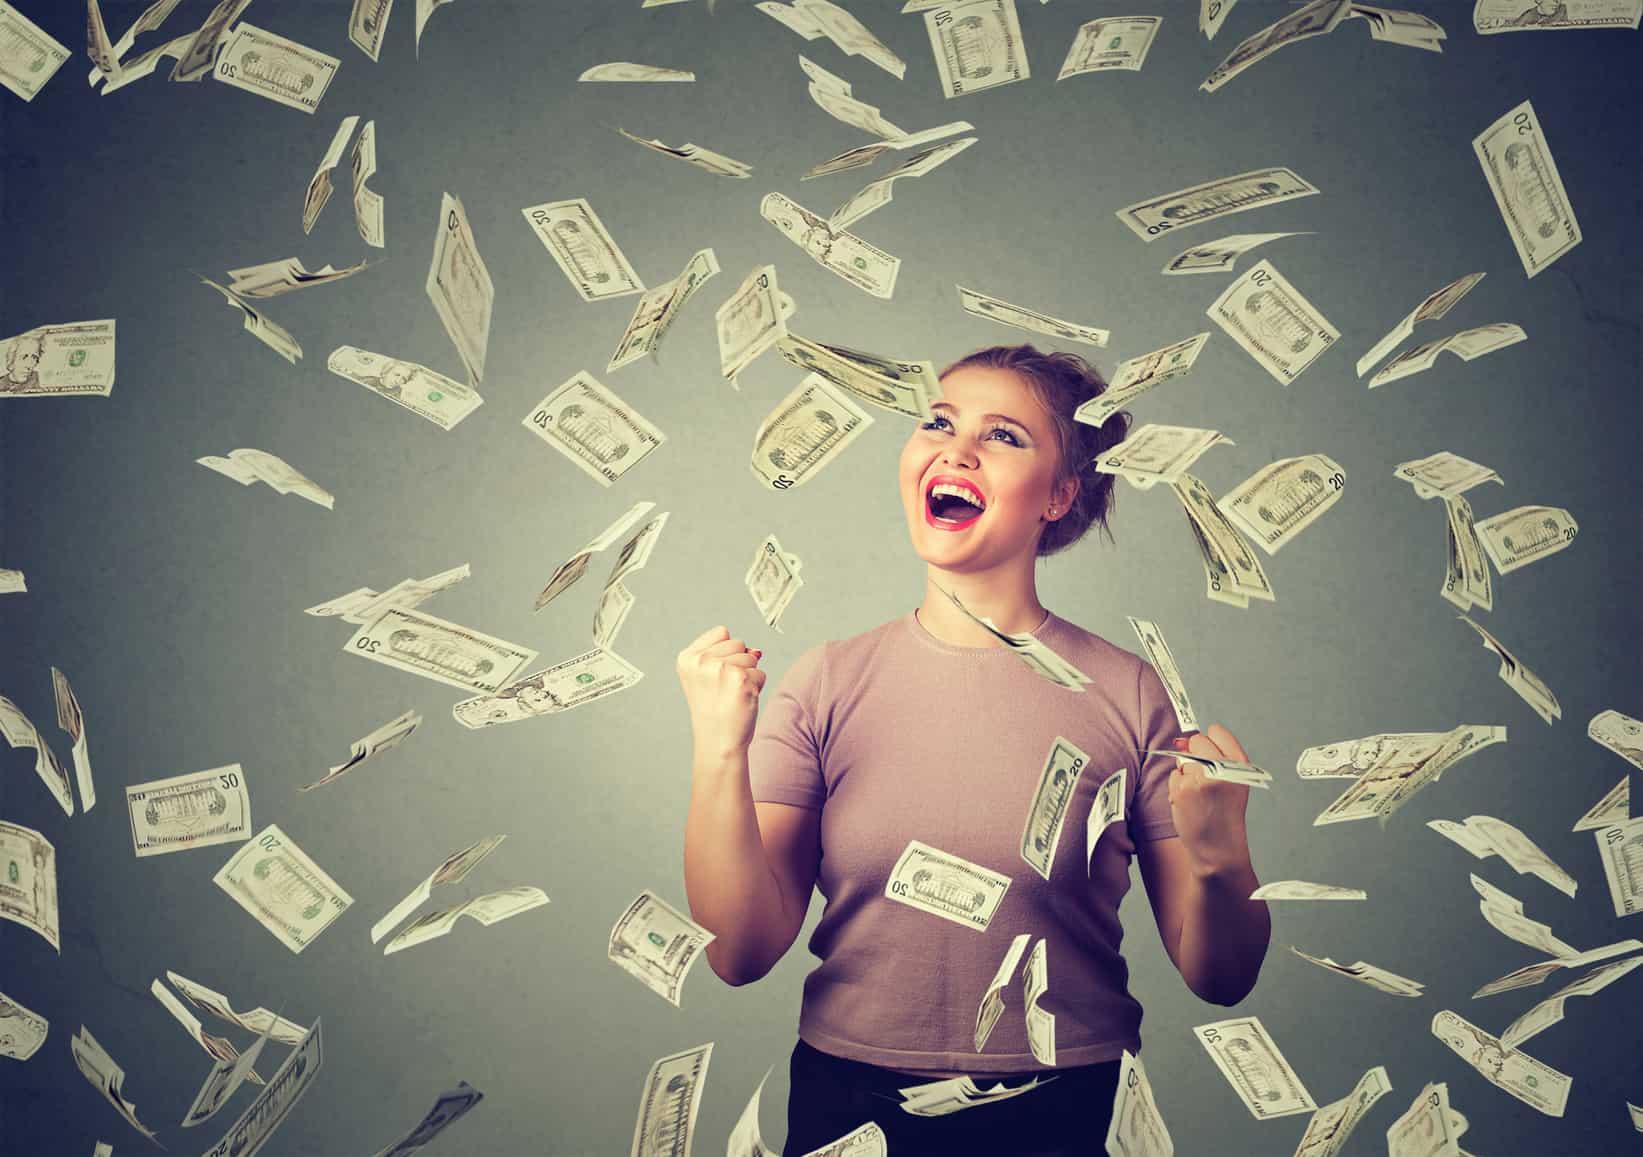 Mujer feliz por ganar beca